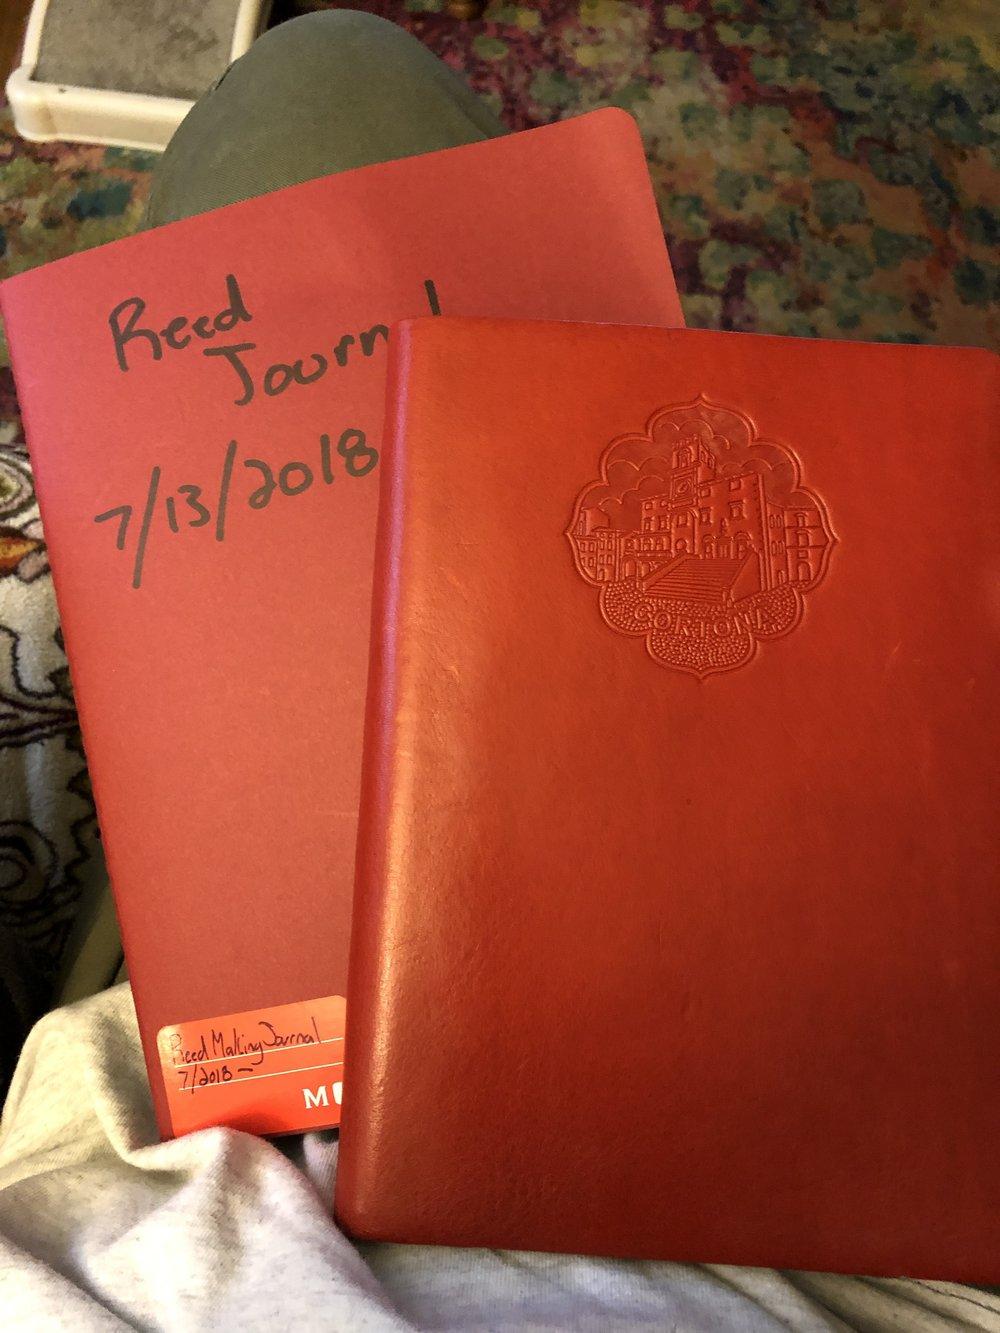 Left, Moleskin Right, Leather Journal from Cortona, Italy…I like red.